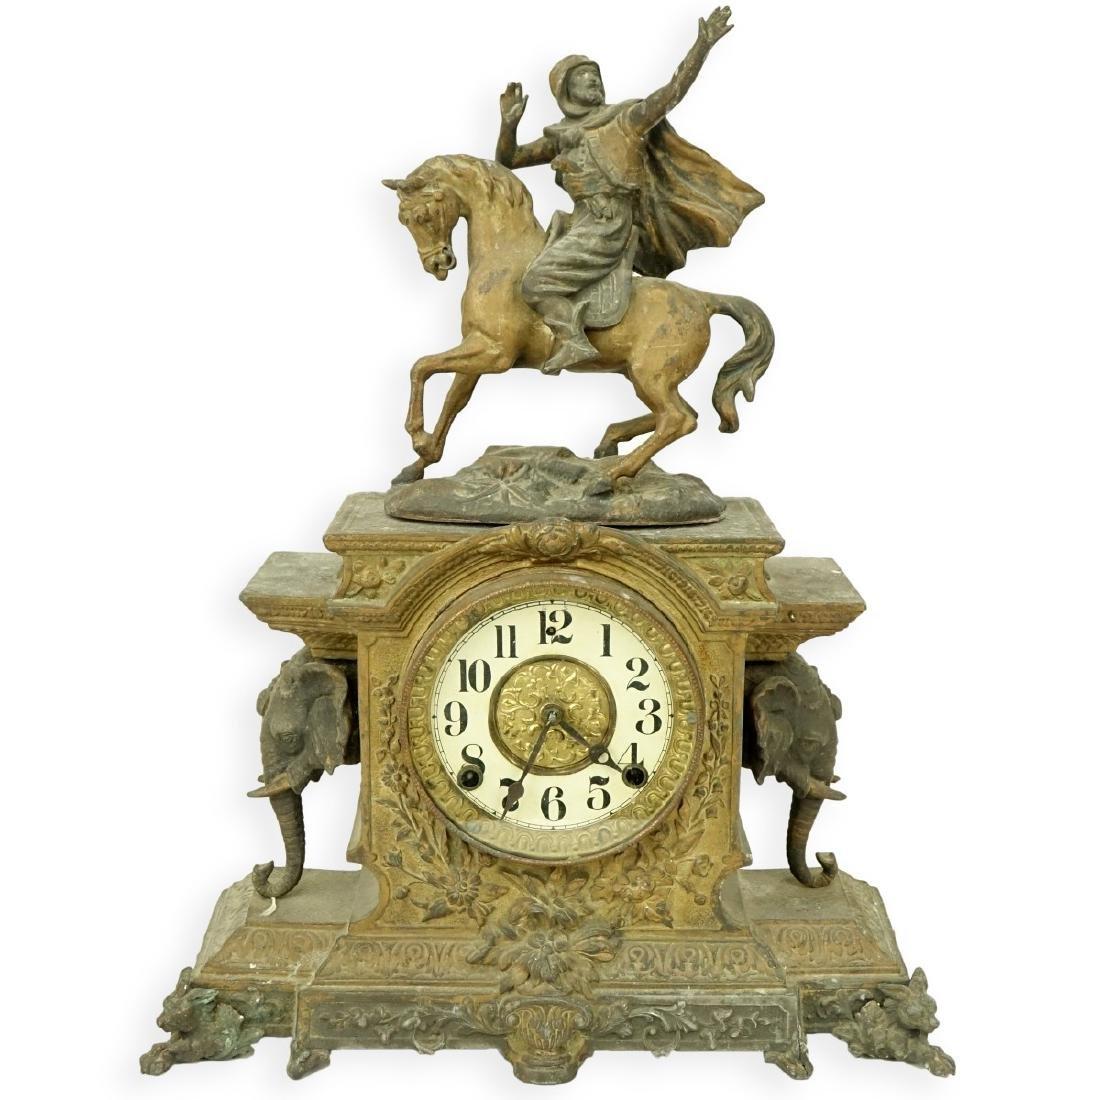 Antique Spelter Orientalist Figural Mantle Clock